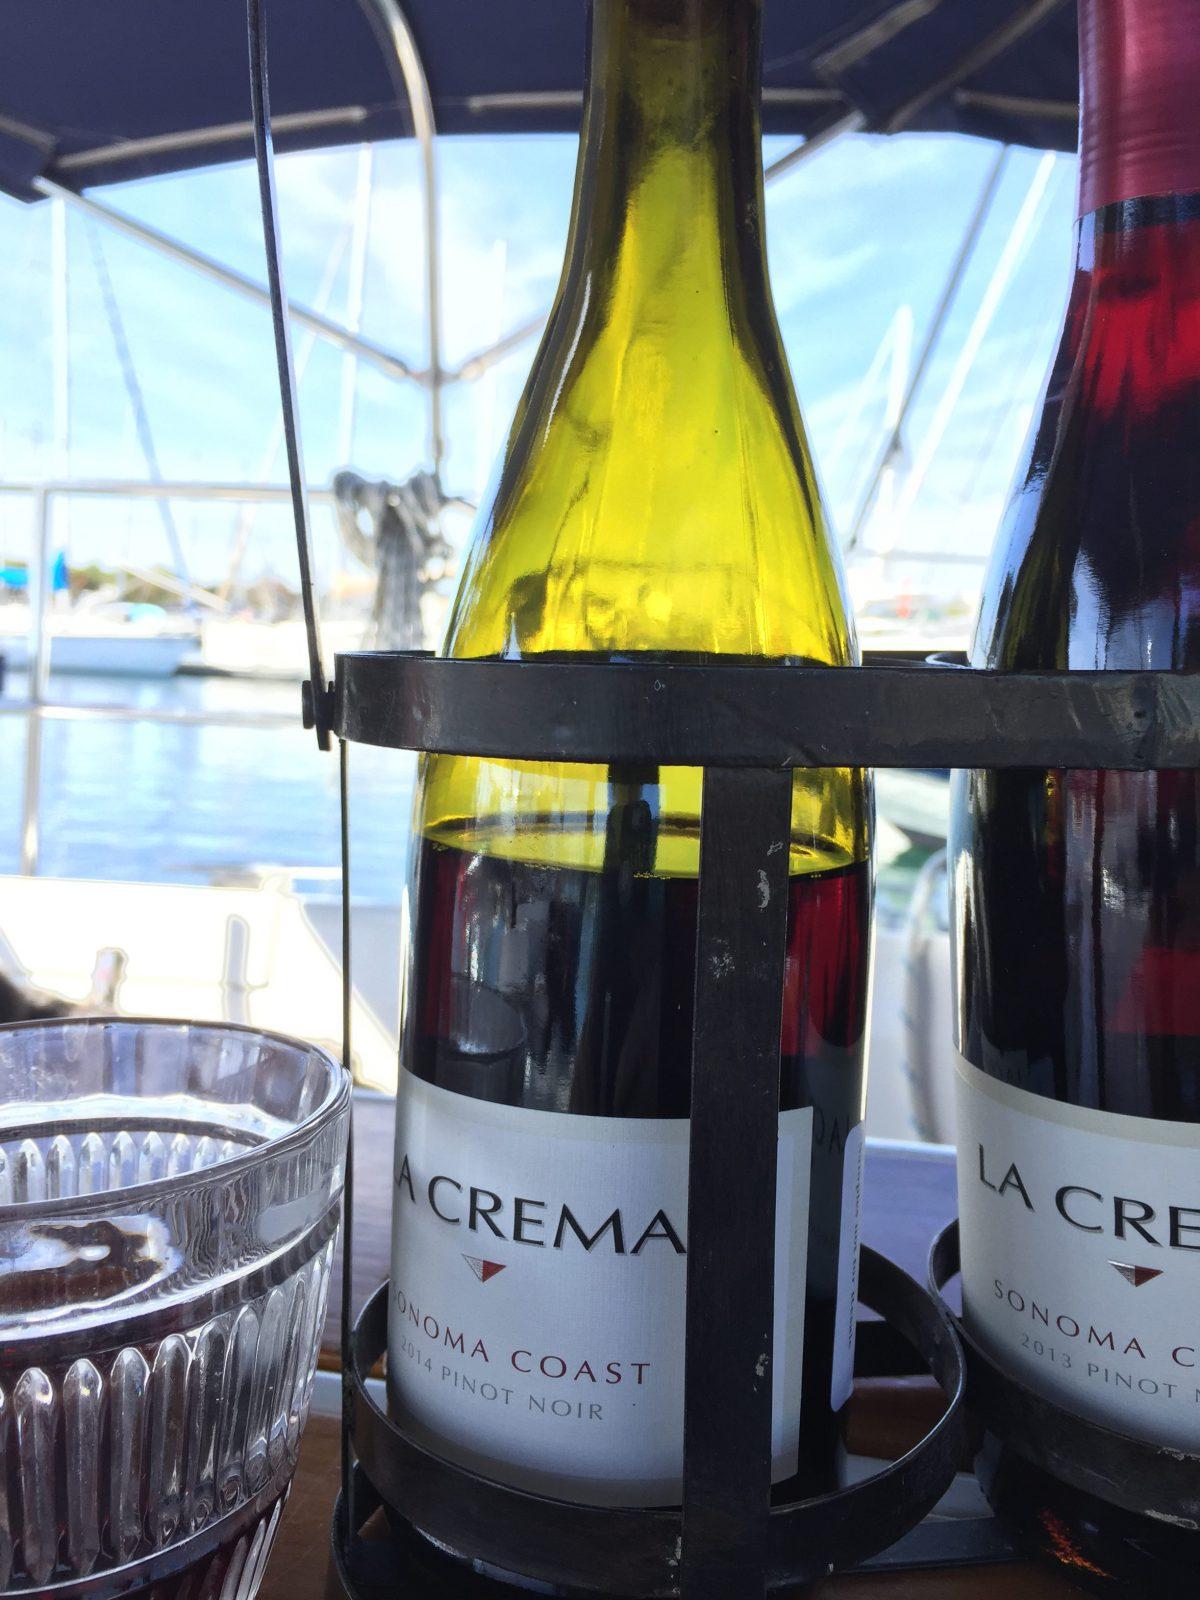 Wine Review: La Crema Sonoma Coast Pinot Noir 2014